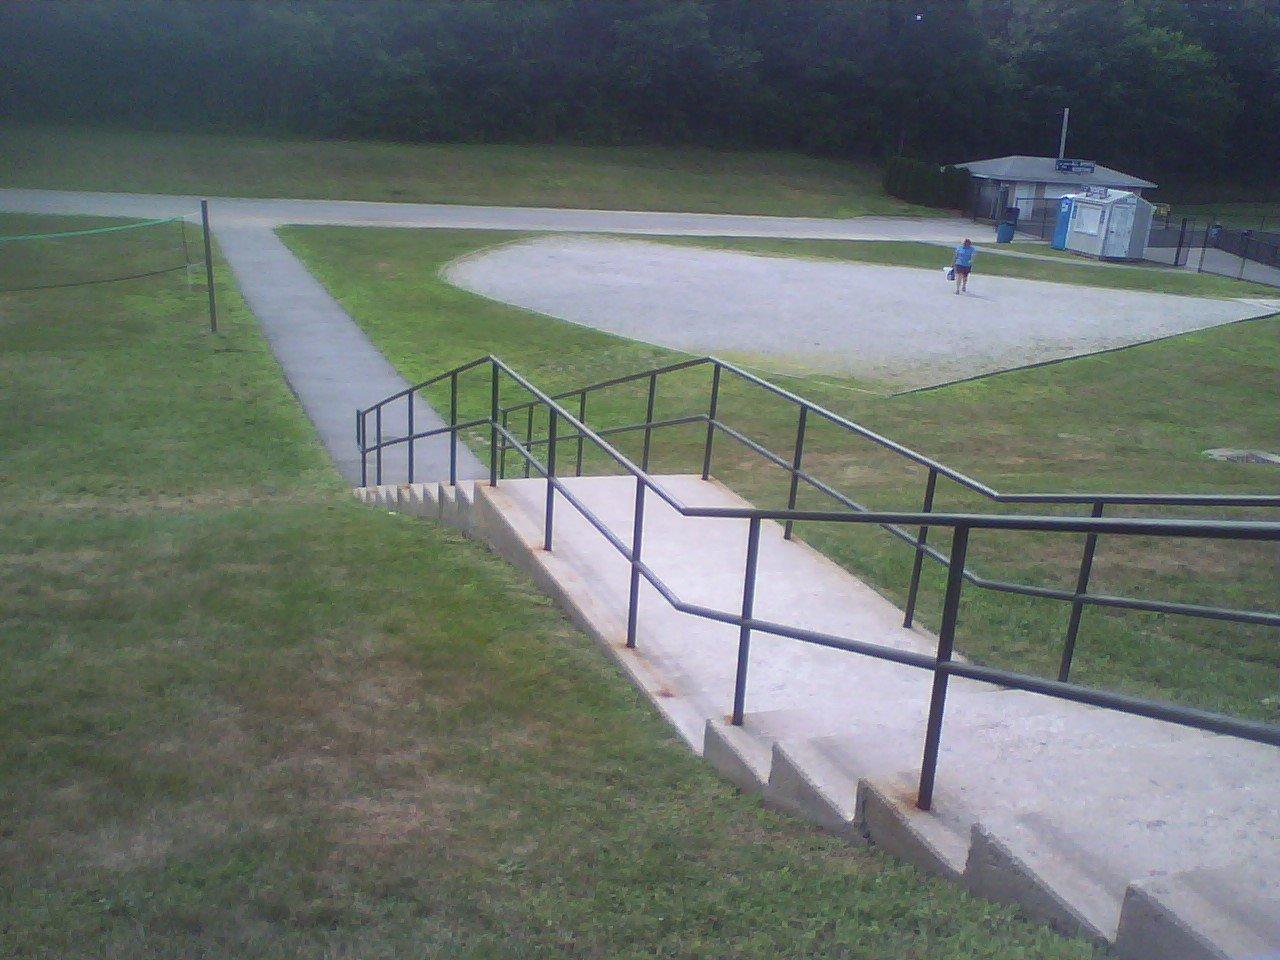 Rail at my old high school